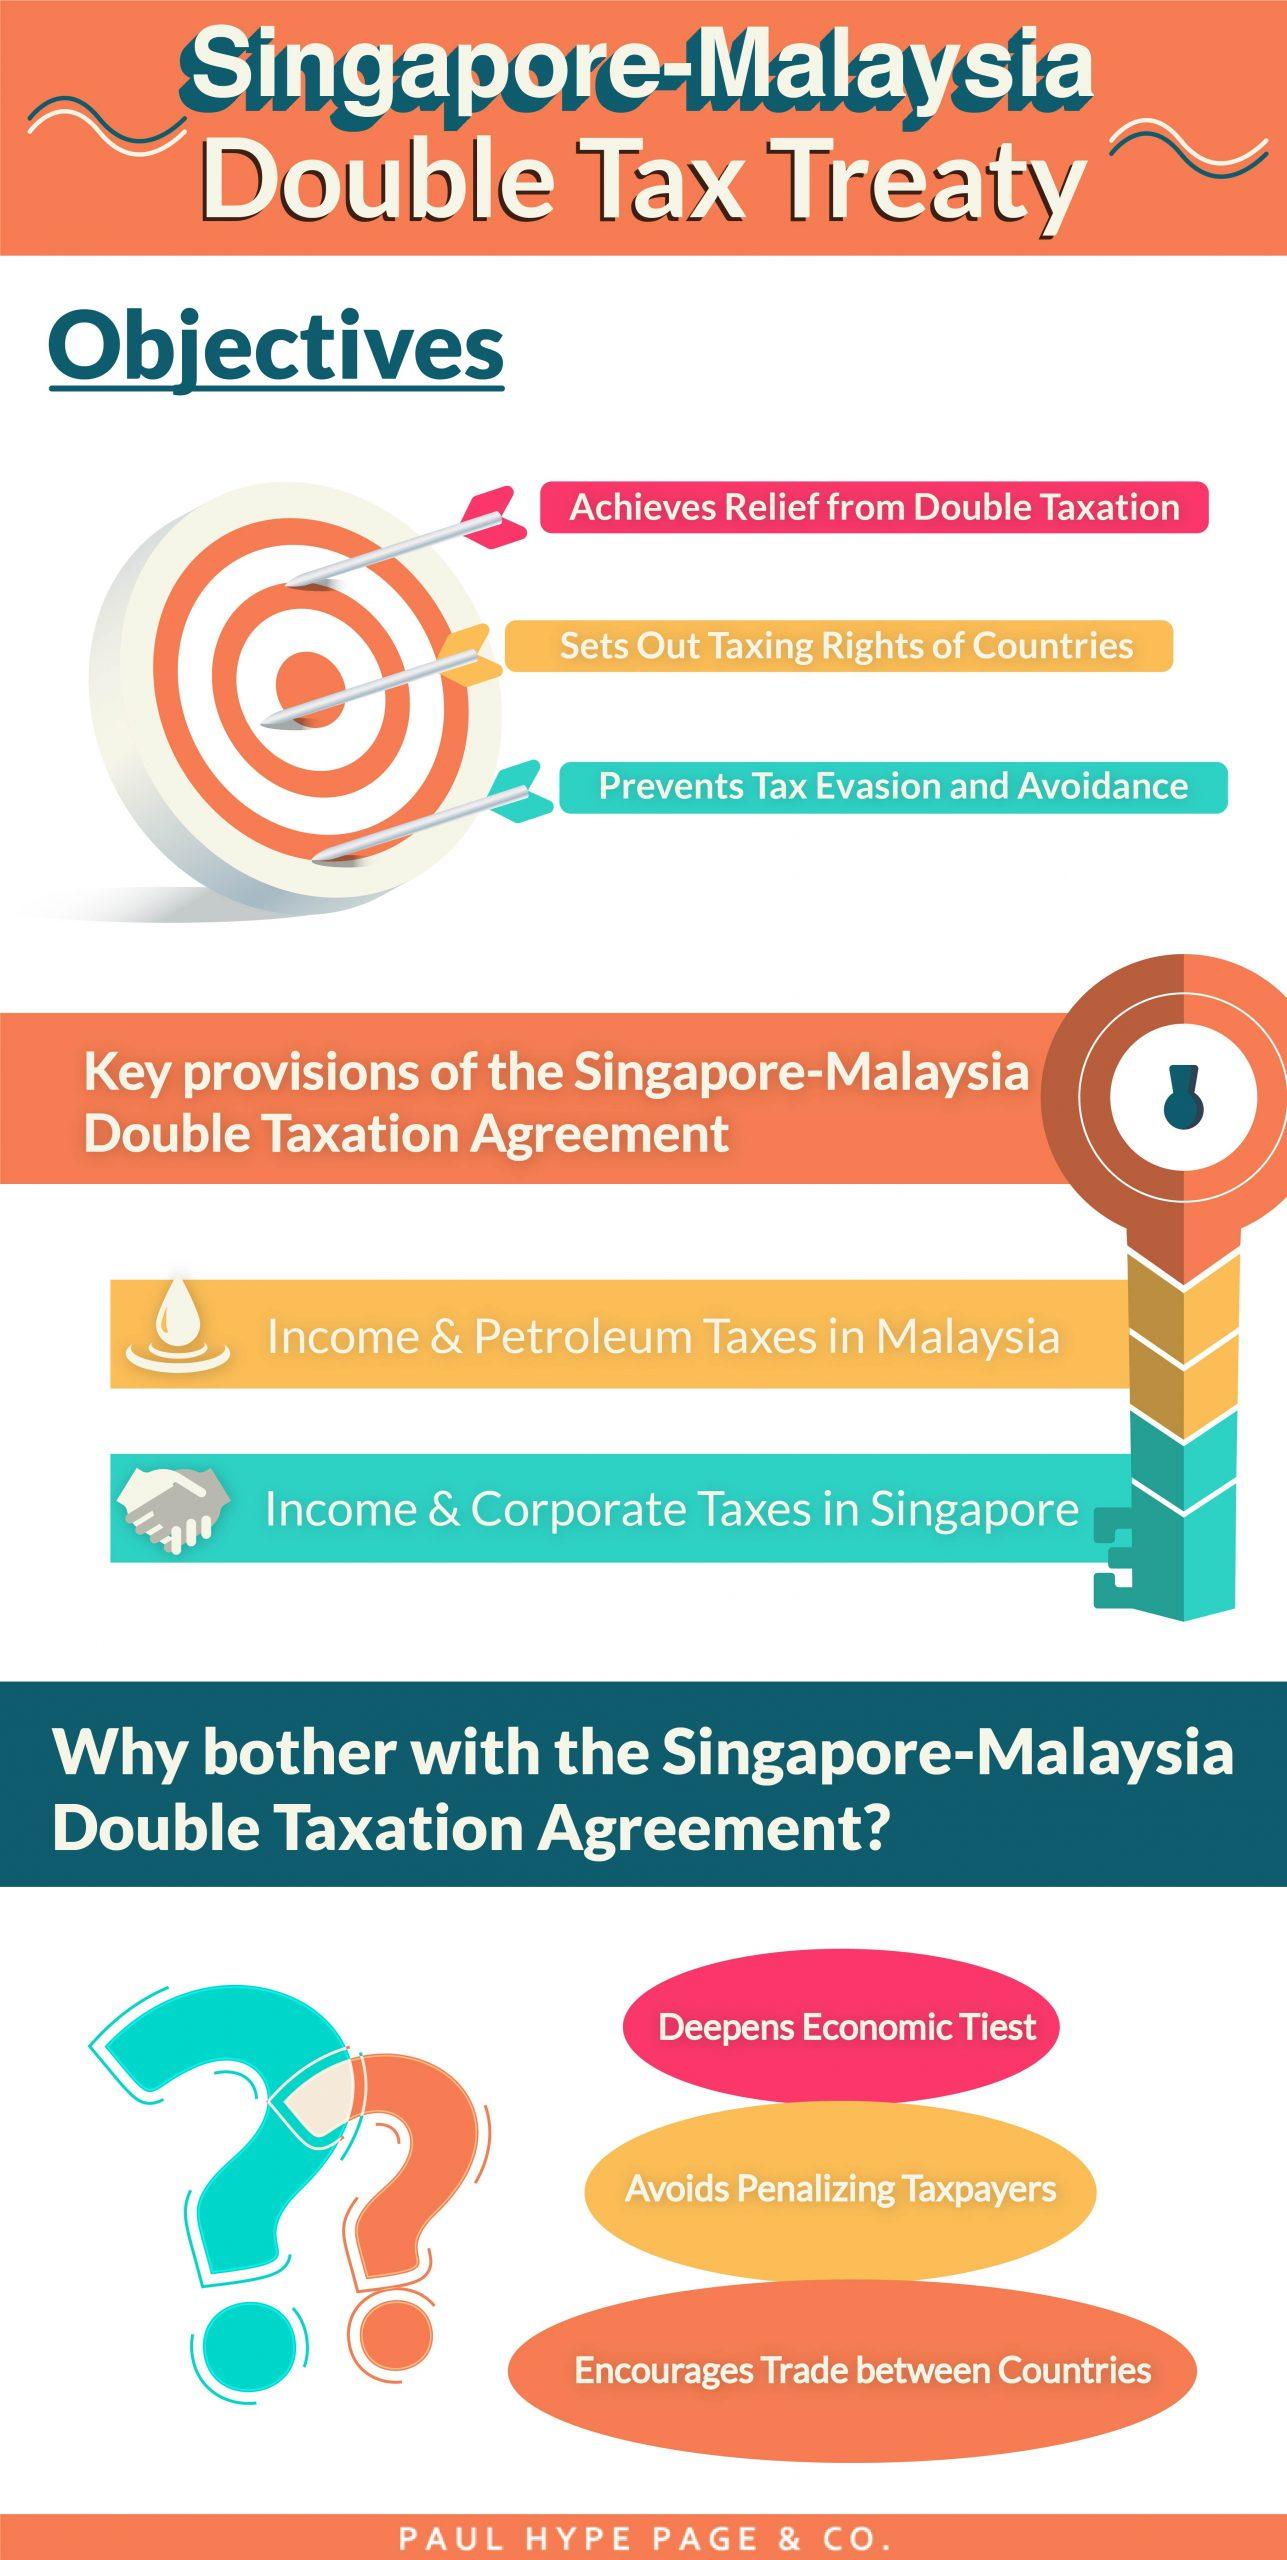 Objectives of the Singapore-Malaysia Double Tax Treaty